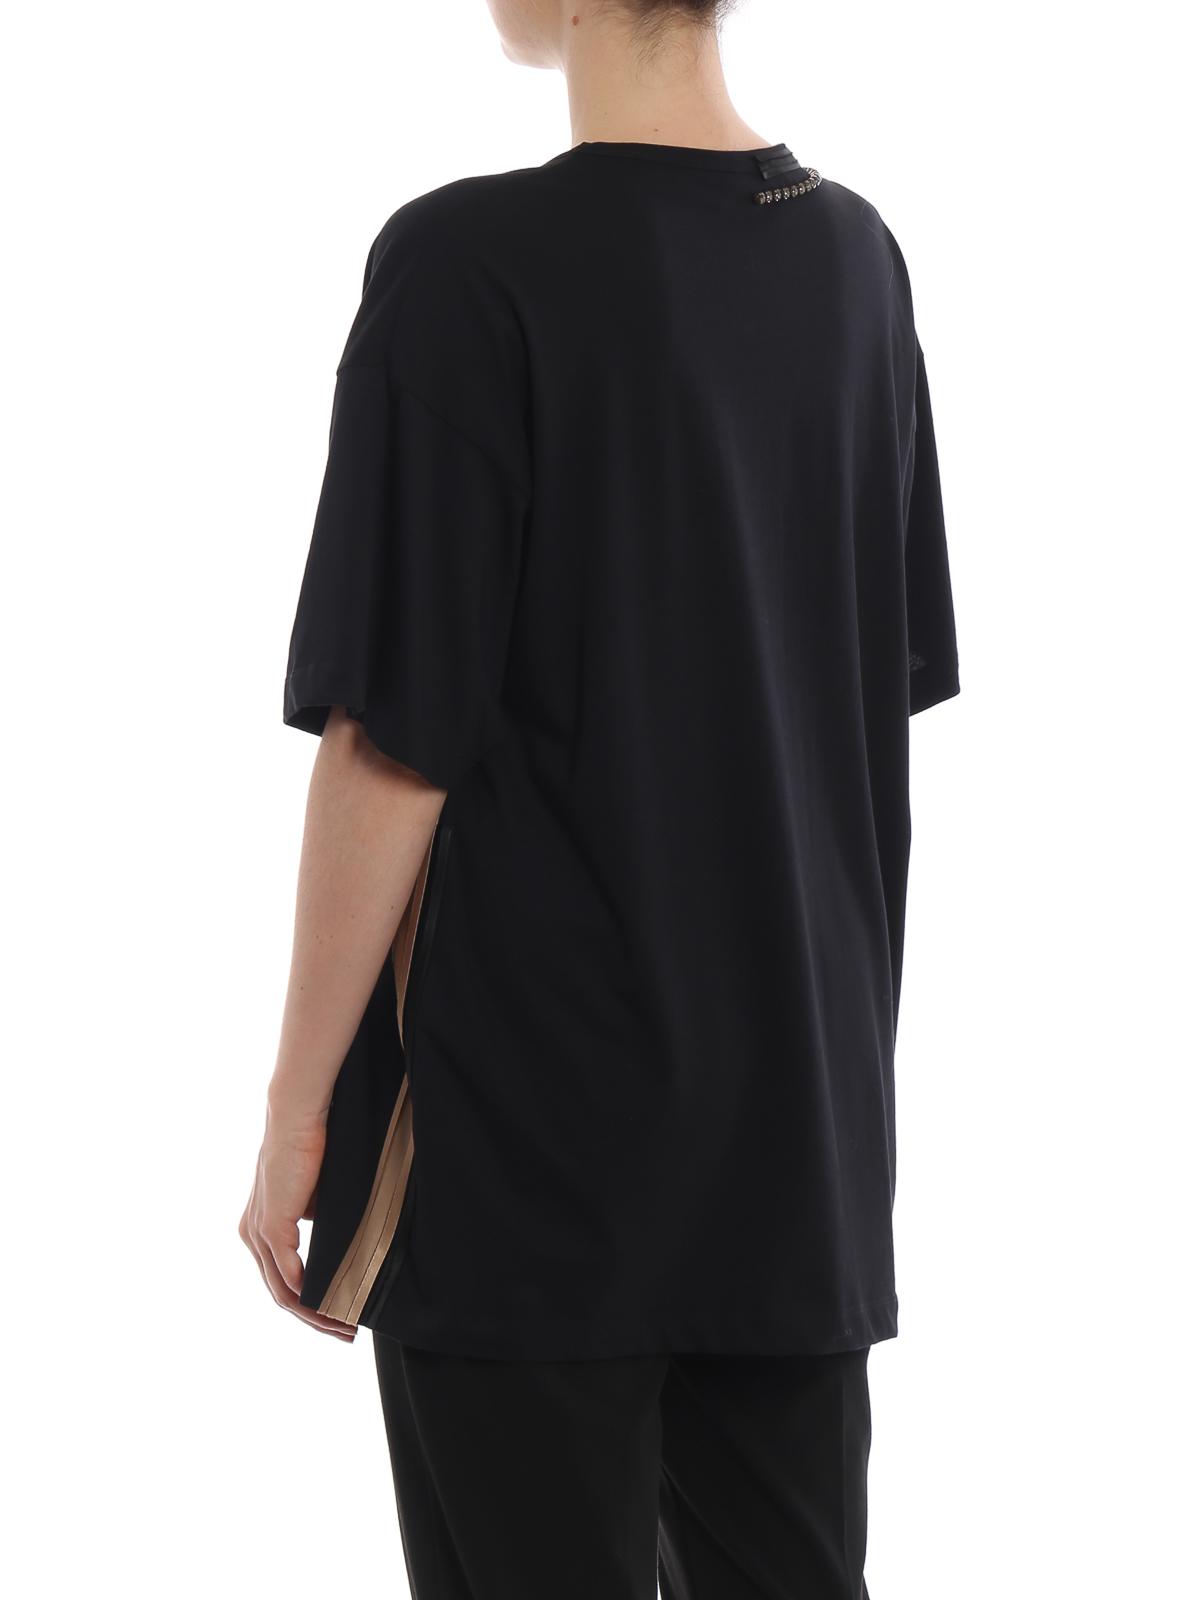 N 21 T Shirt Schwarz T Shirts 18in2p0f06141579000 Ikrix Com